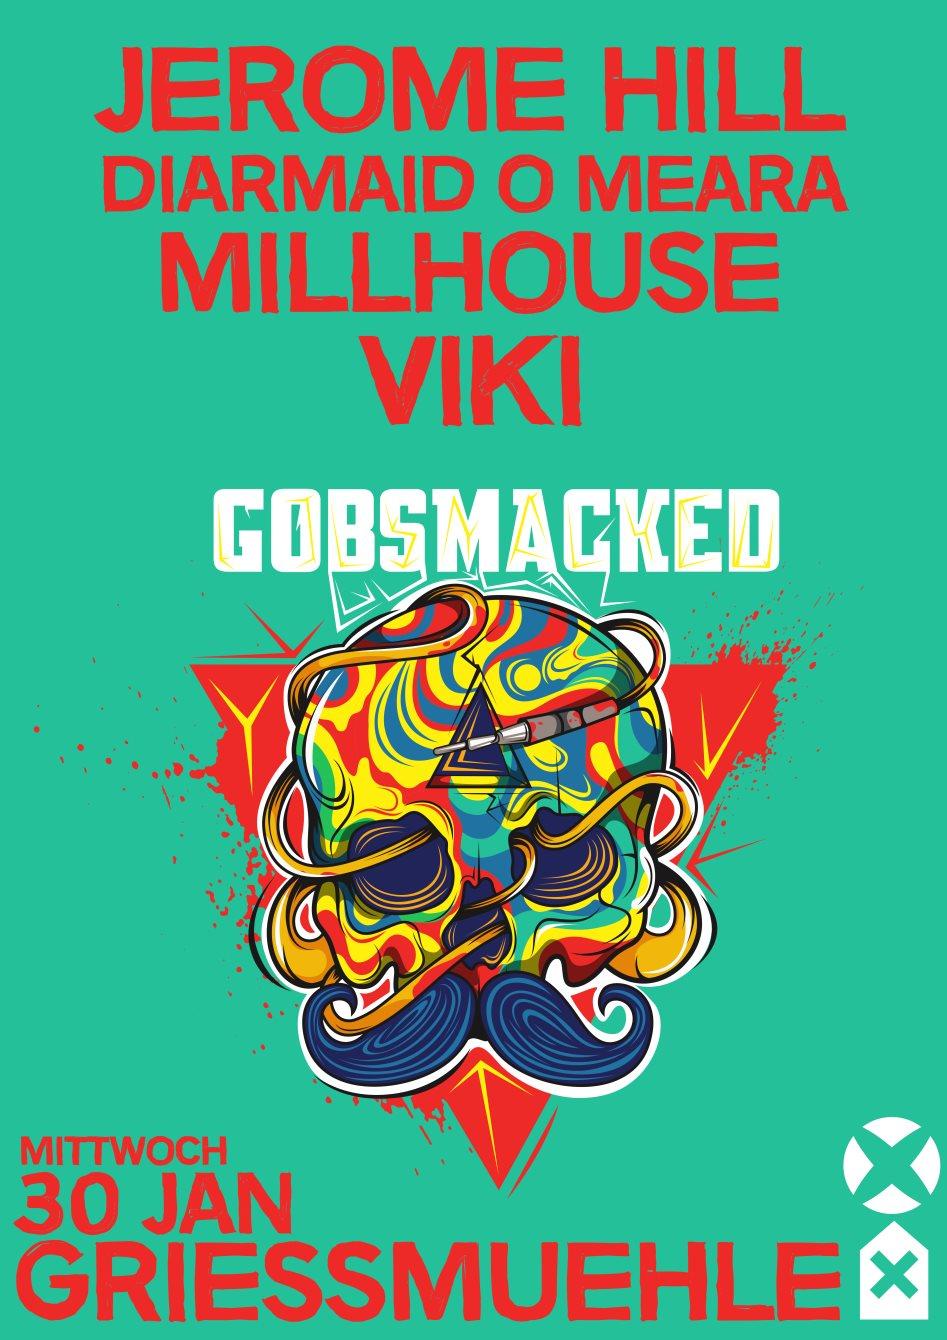 Gobsmacked with Jerome Hill, Diarmaid O Meara uvm. - Flyer back